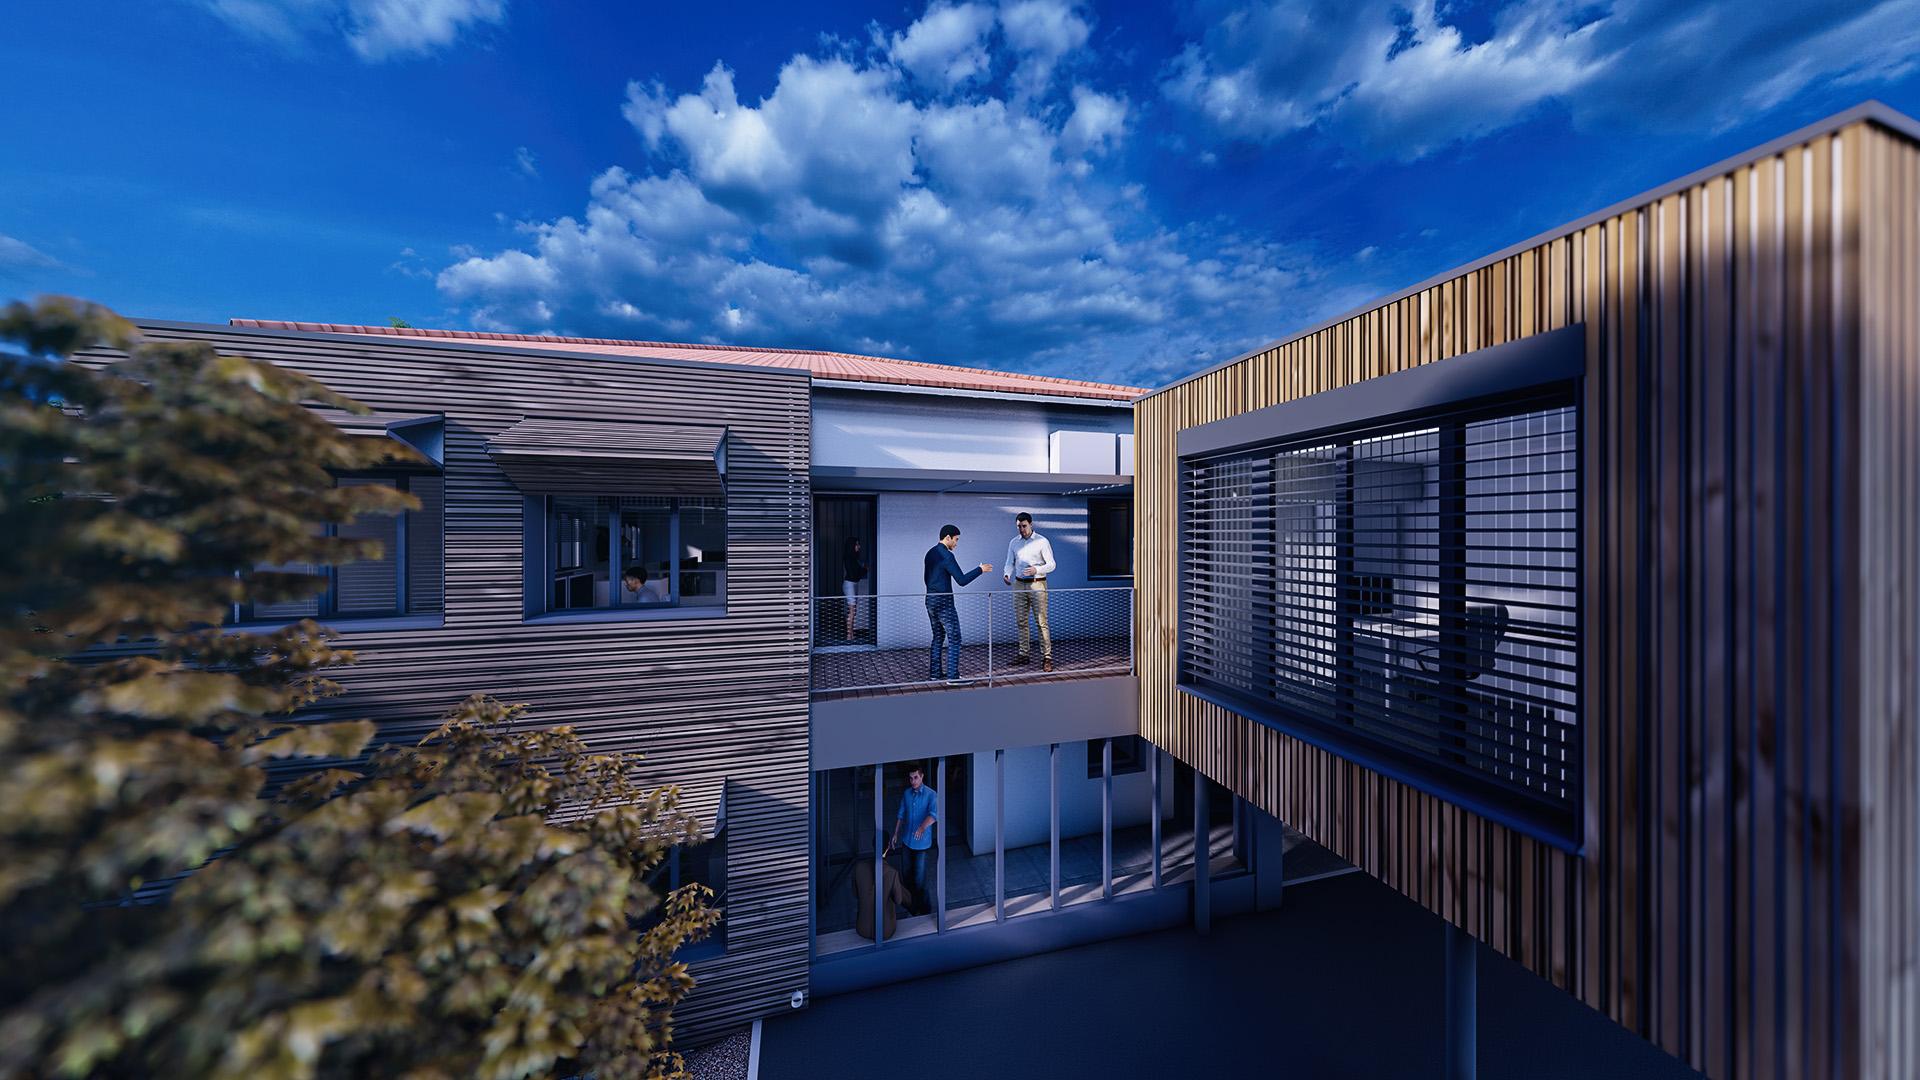 Maitrise D Oeuvre Montpellier montpellier – lhenry architecture